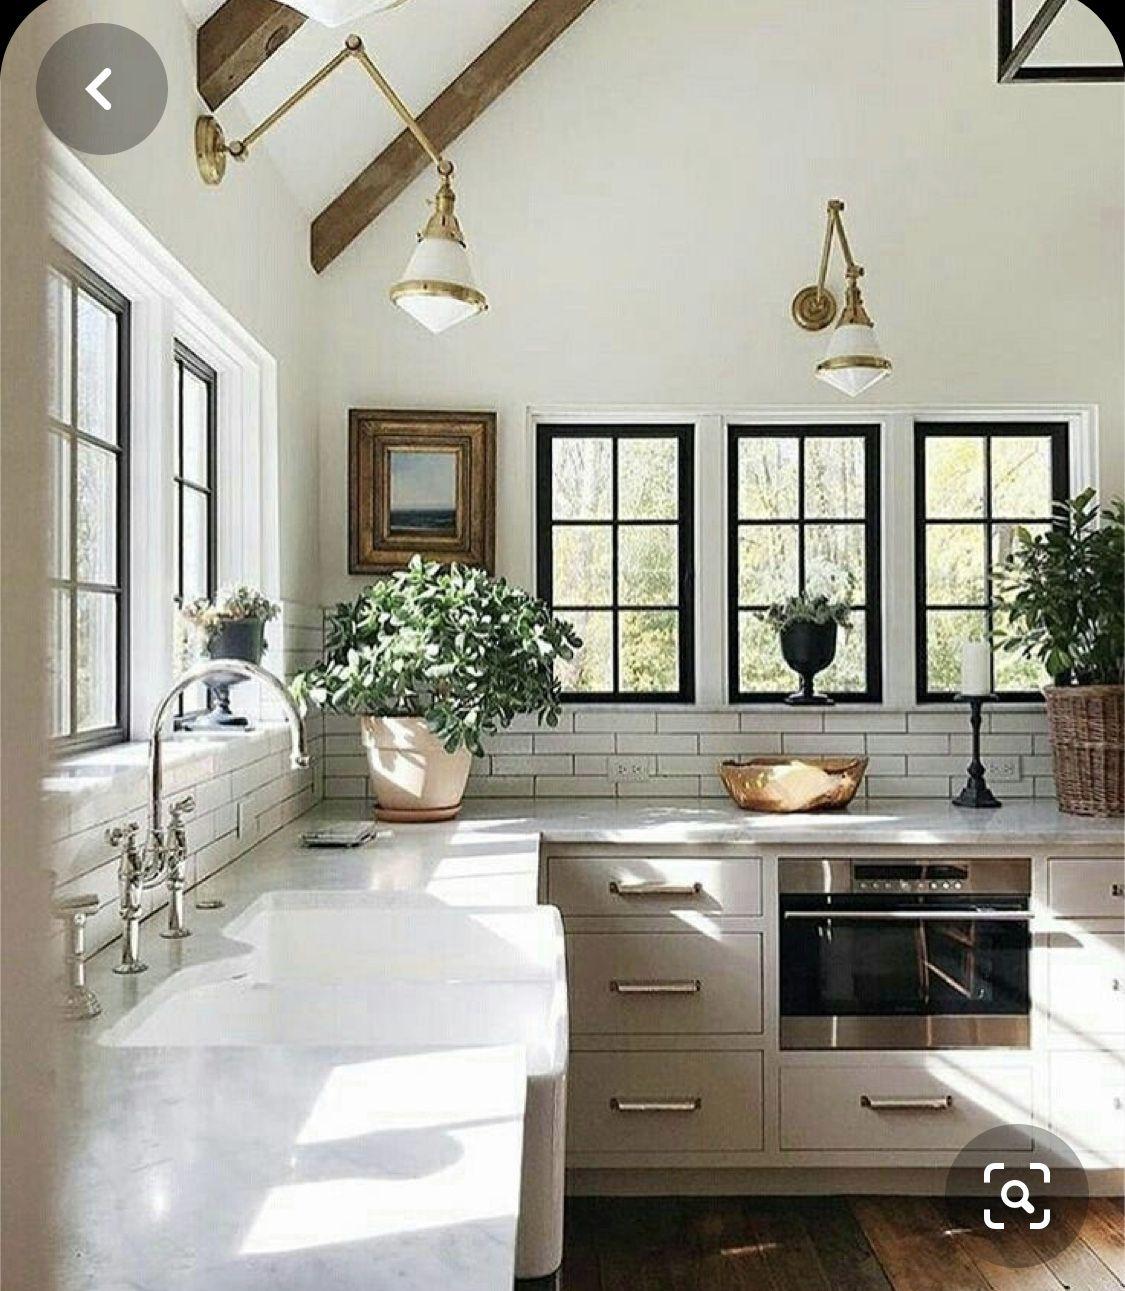 Architecture in 2020 Farmhouse kitchen design, Modern